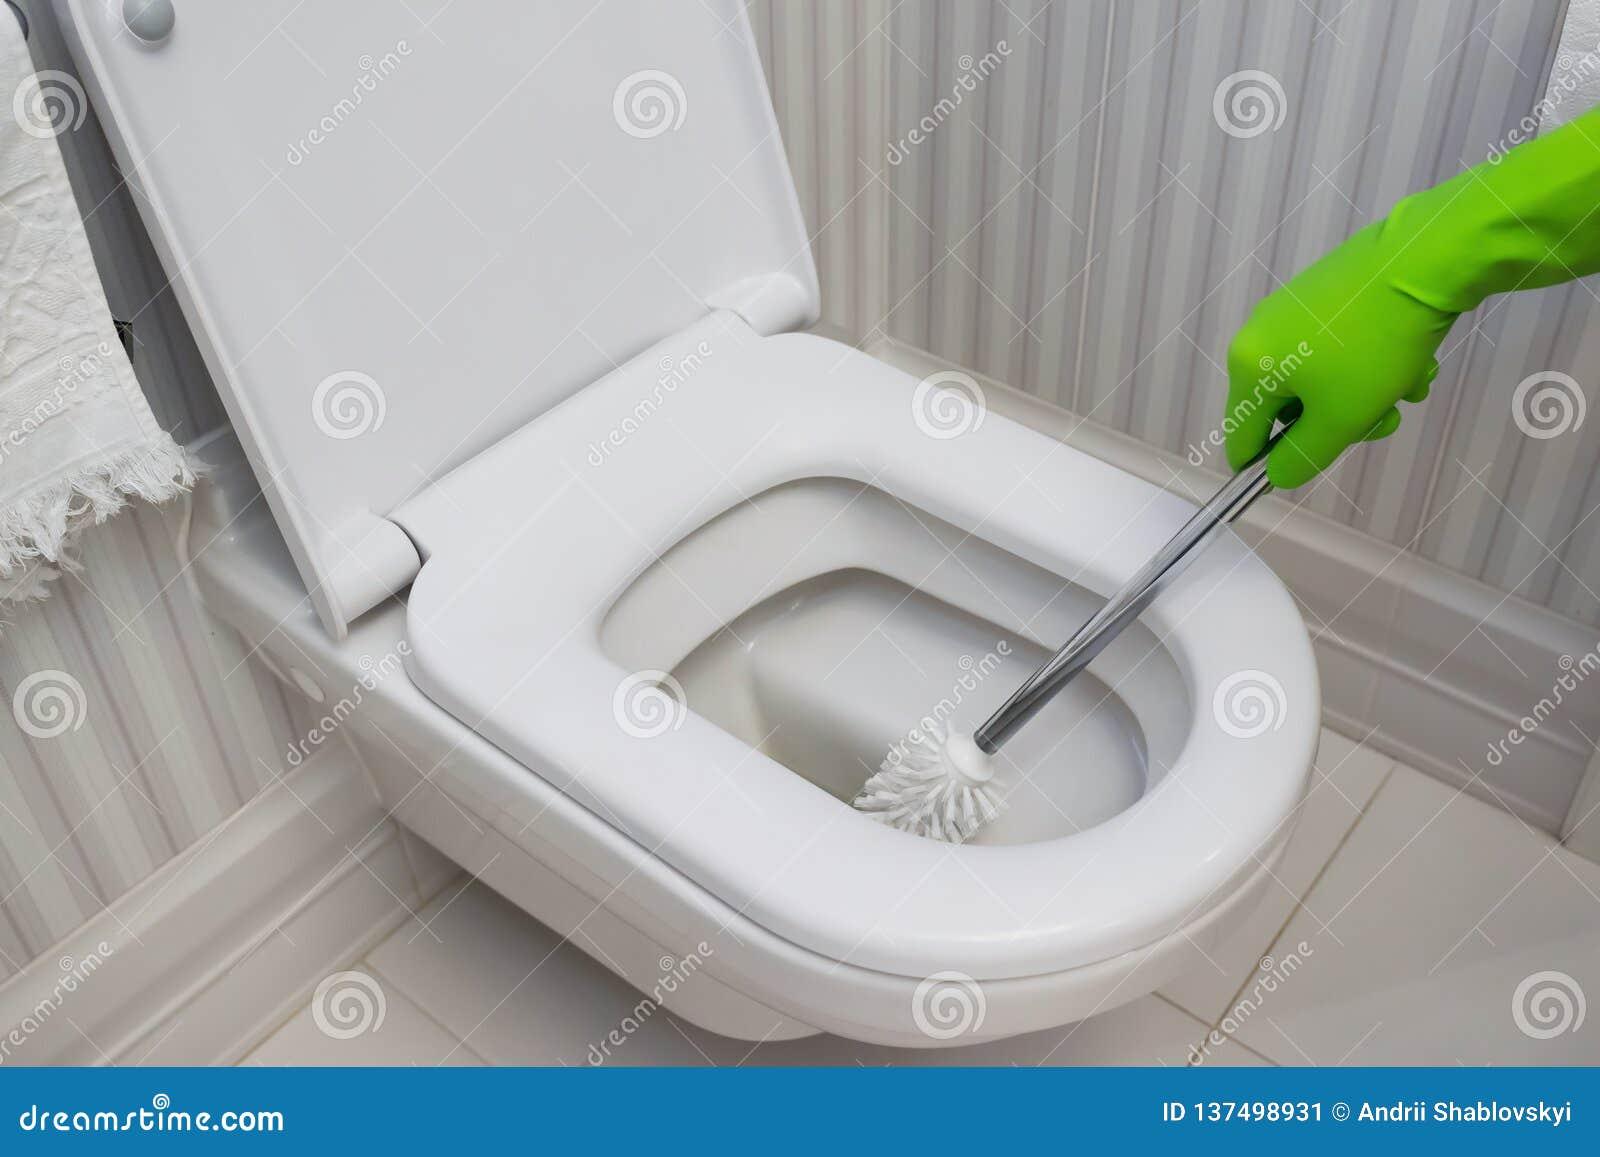 Toilettensch?sselreinigung Reiniger in den grünen Gummihandschuhen